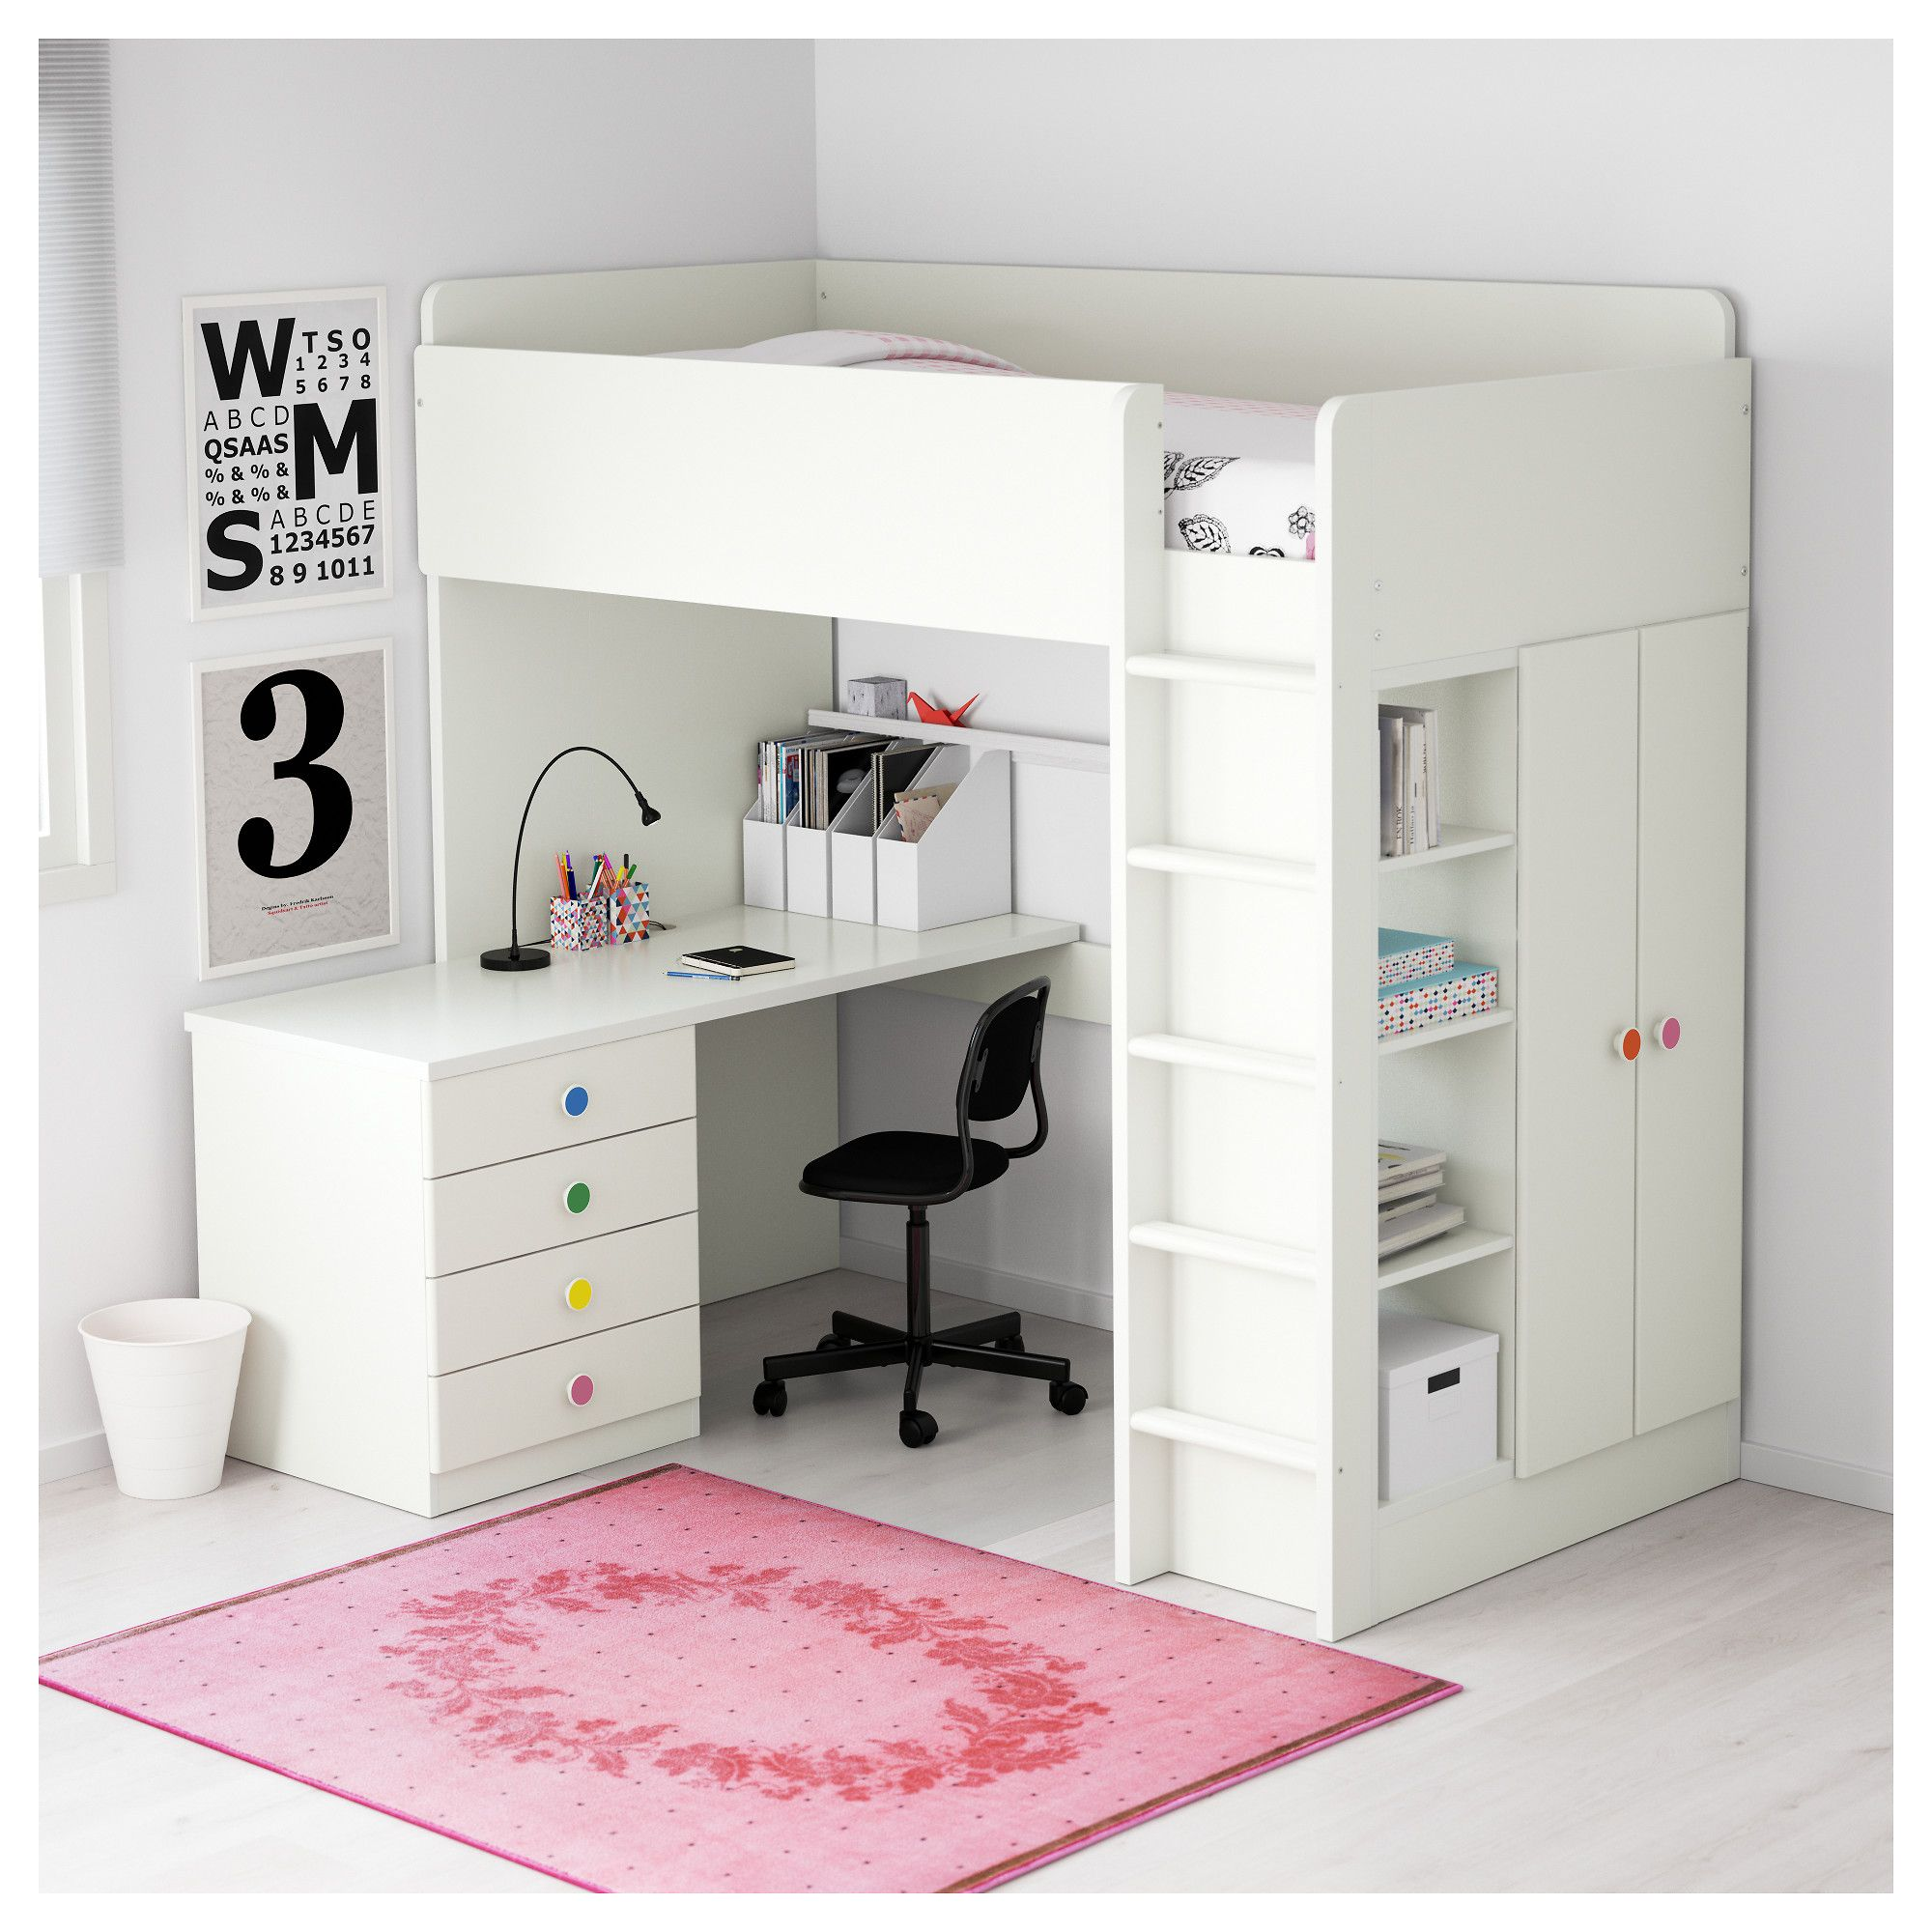 Shop For Furniture Home Accessories More Modern Loft Bed Girls Loft Bed Bed For Girls Room